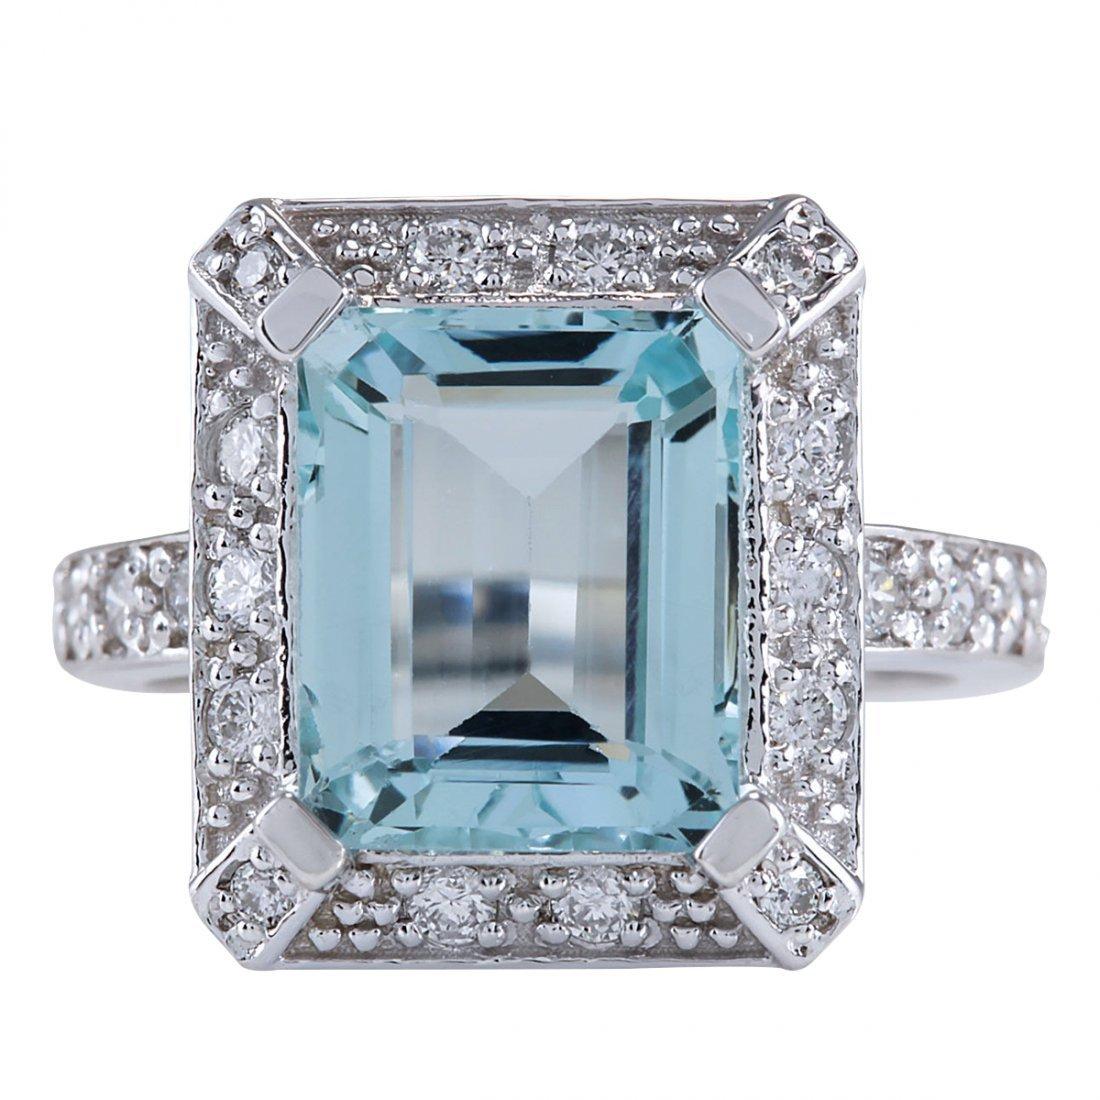 4.85CTW Natural Aquamarine And Diamond Ring In 14K